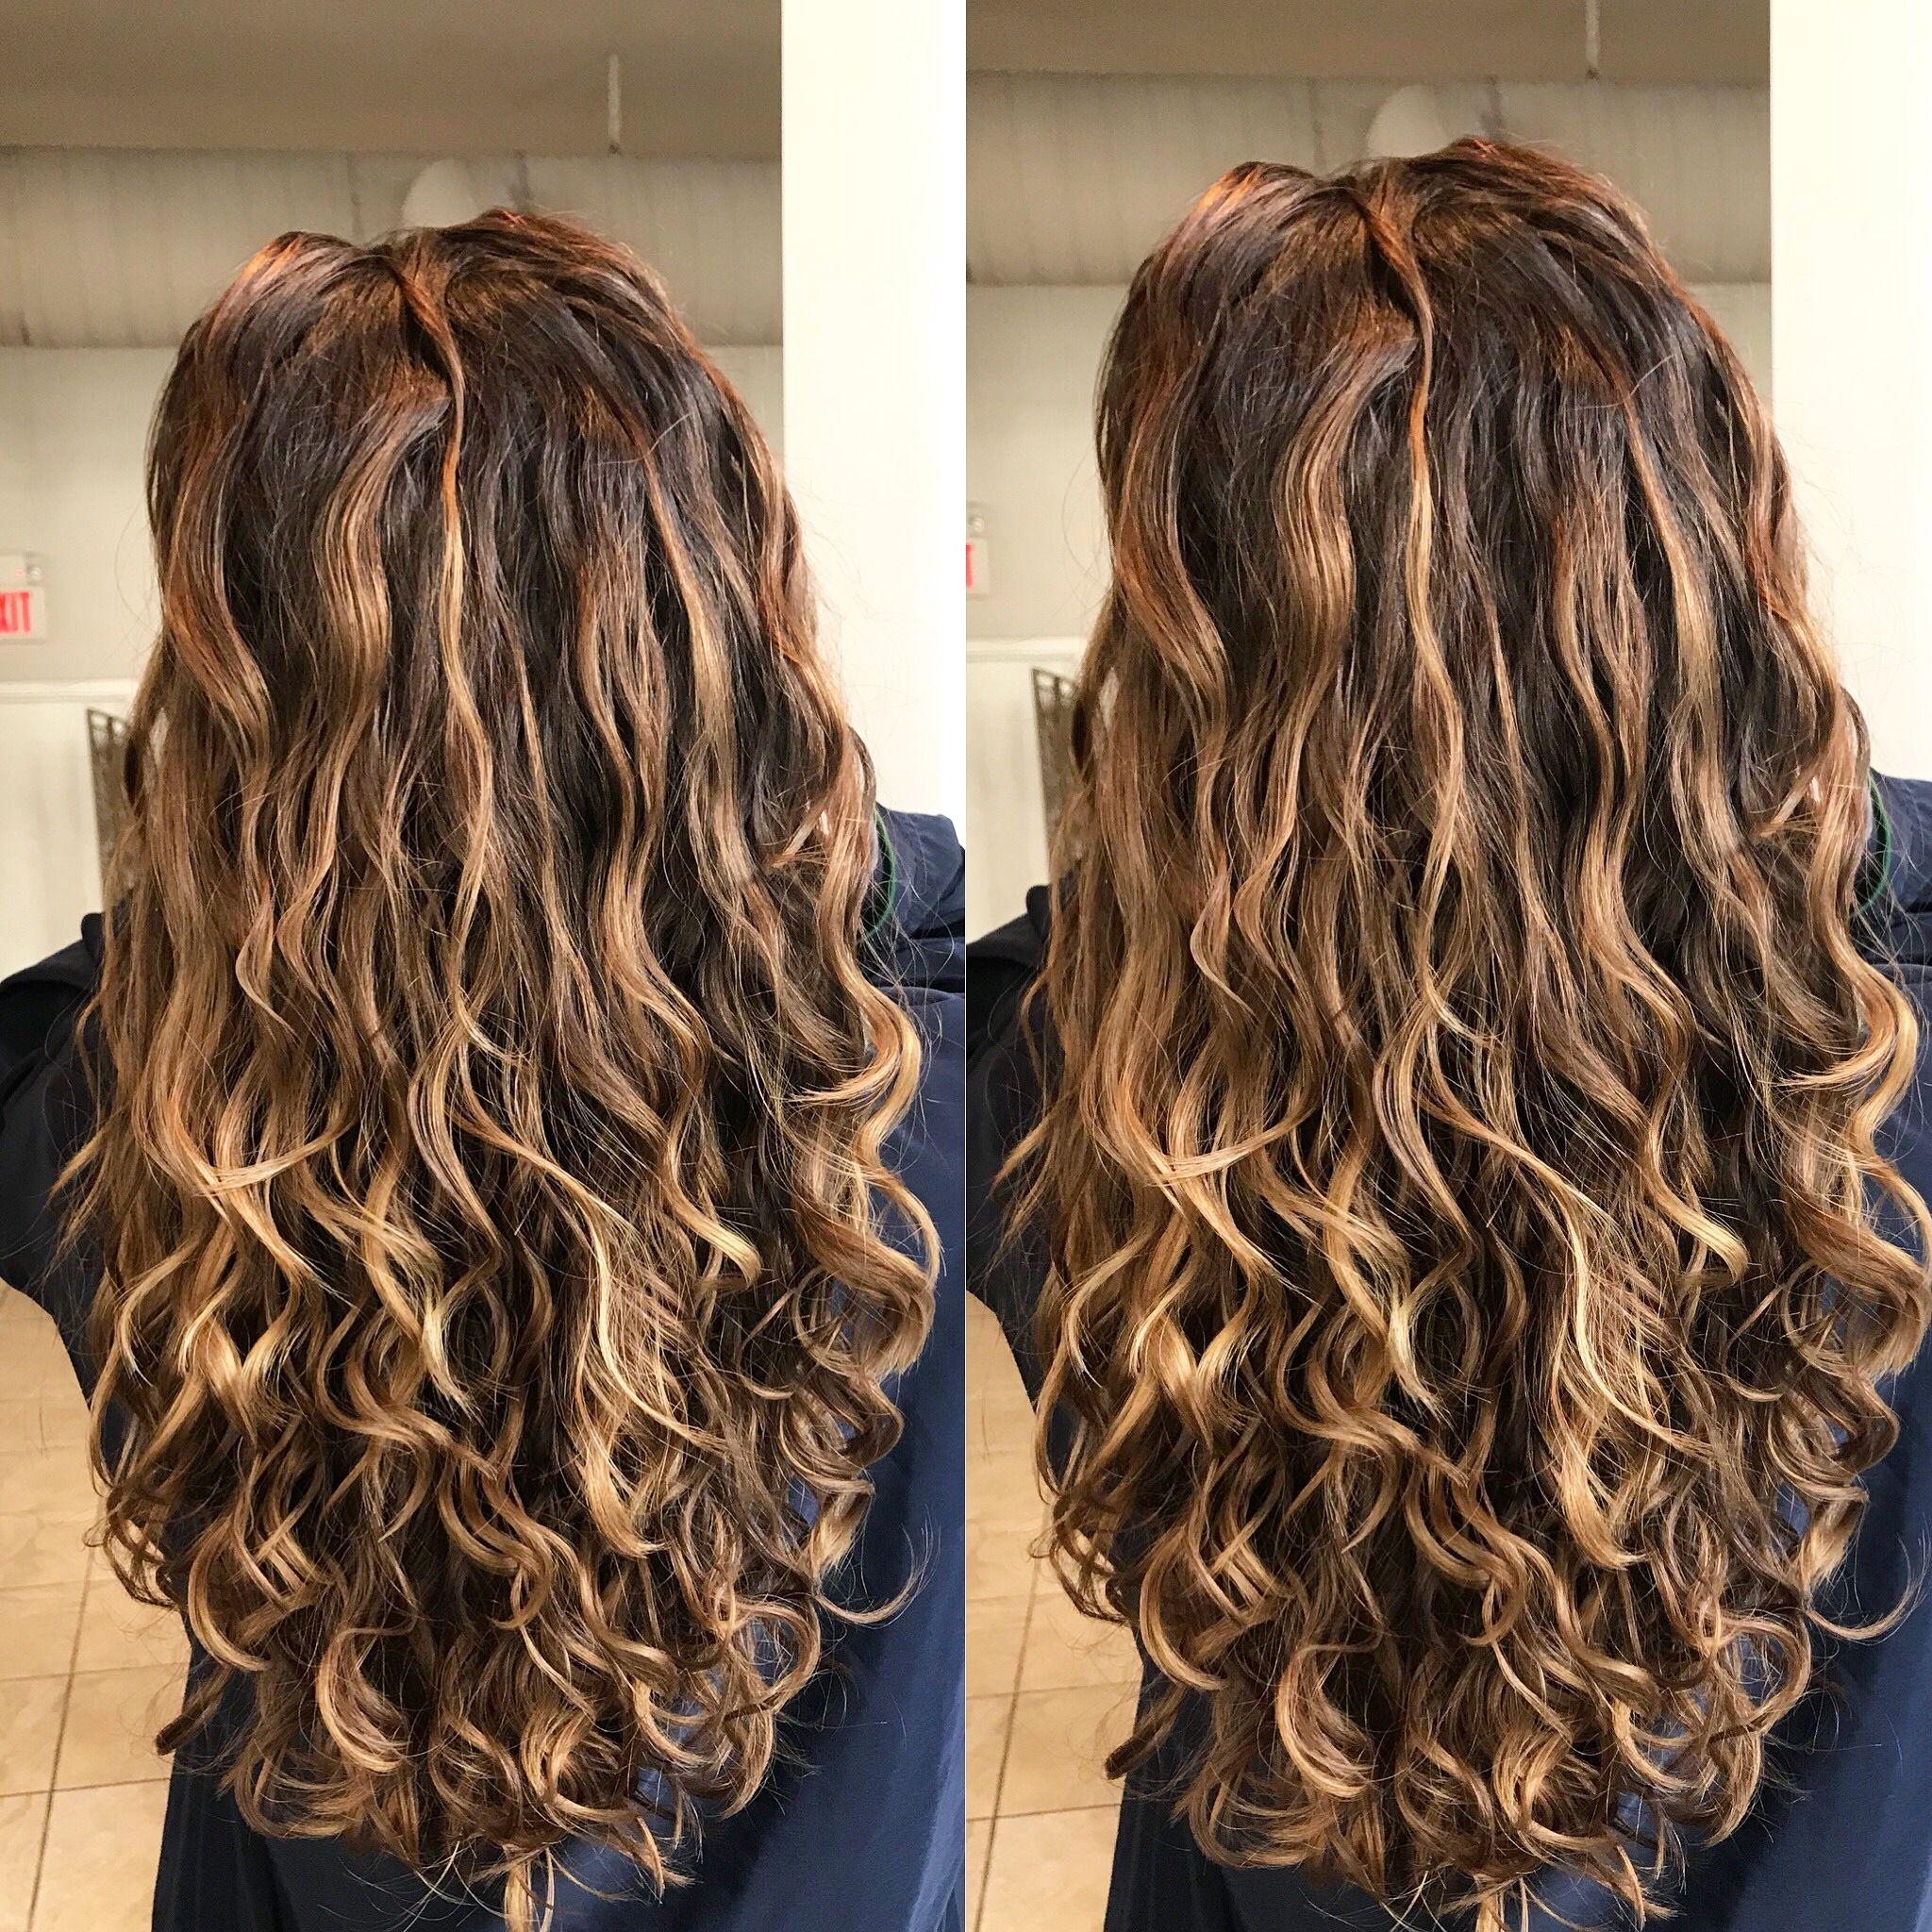 Pin By Vaza Salon On Balayage Highlights Curly Hair Styles Curly Hair Styles Naturally Hair Inspiration